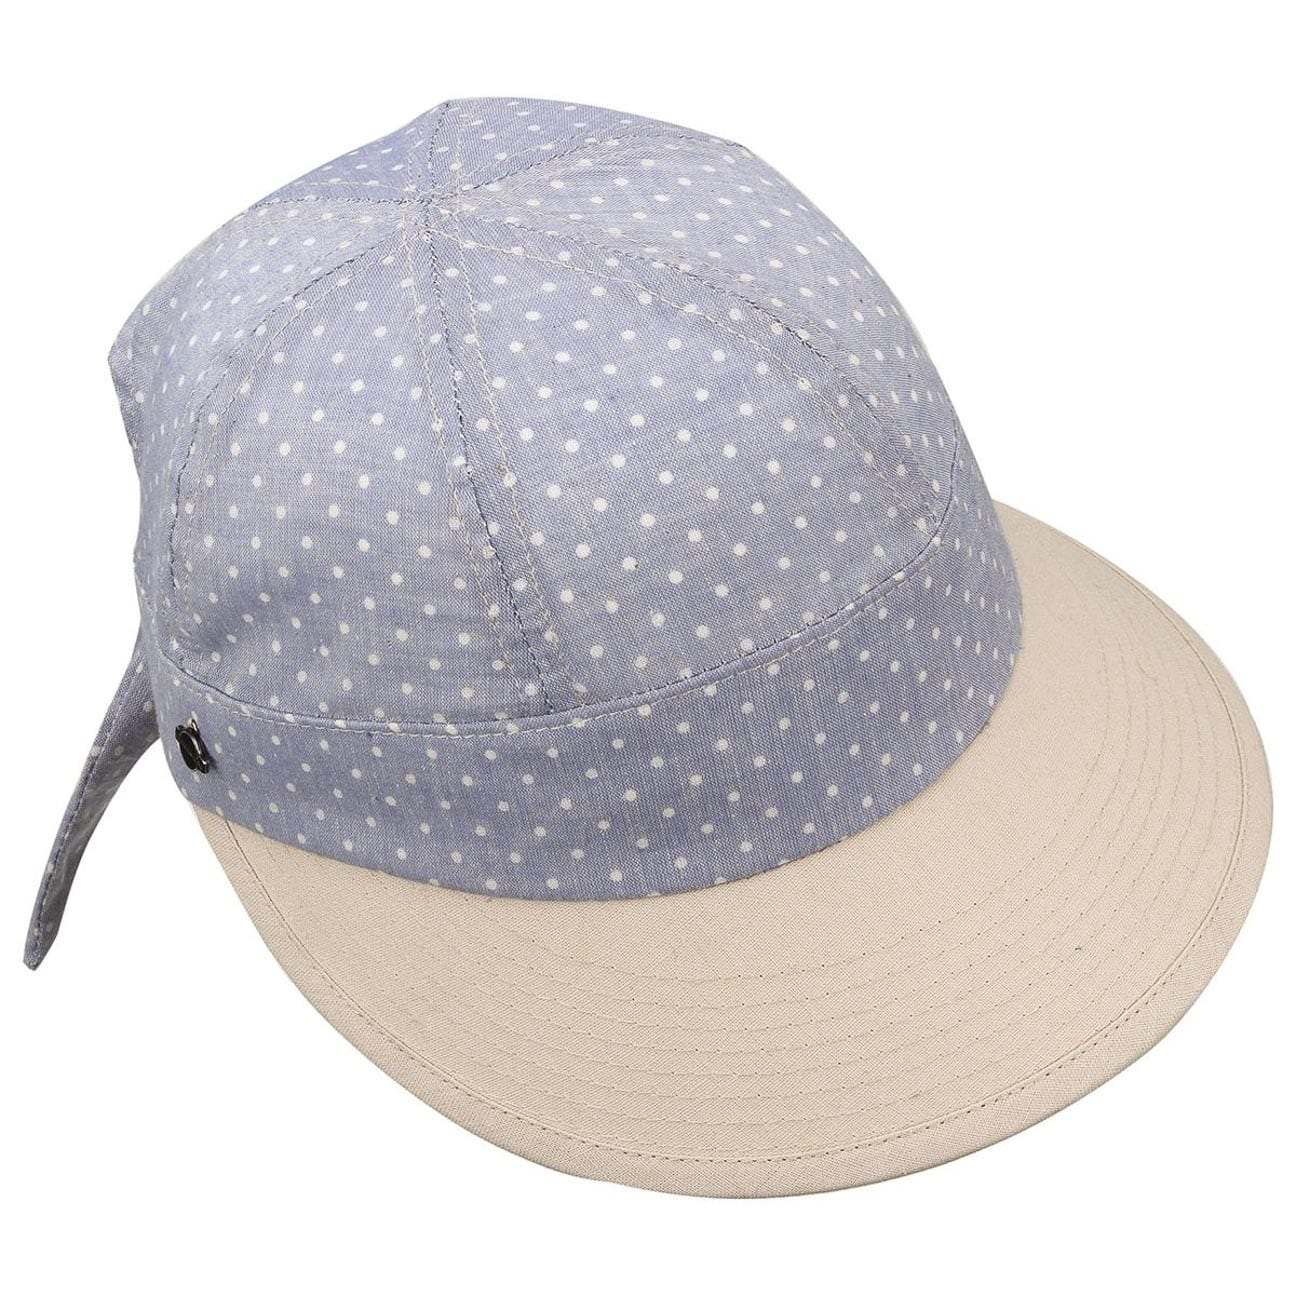 Bandana con Visera de Mujer by Seeberger - Gorros - sombreroshop.es e3754ea1312